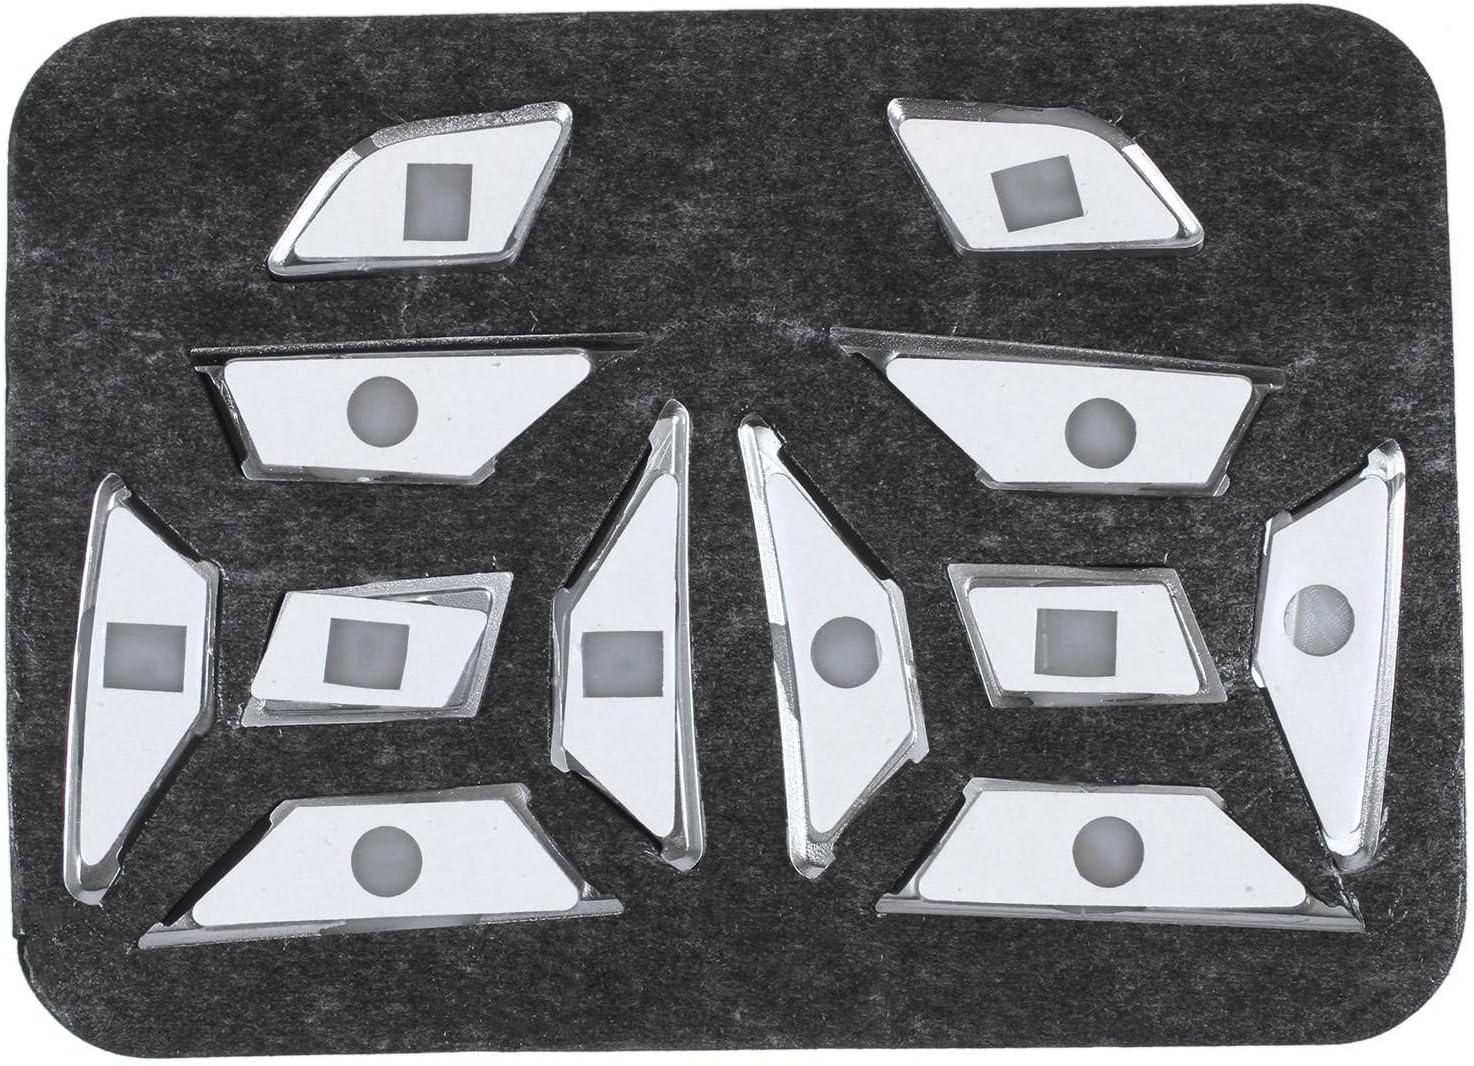 Kirmax Lenk Rad Taste Schalter Trim Abdeckung Aufkleber F/ür Mercedes A B C E Ml Gl Cla Gla Glk Sl SLK Class W176 W246 W212 W204